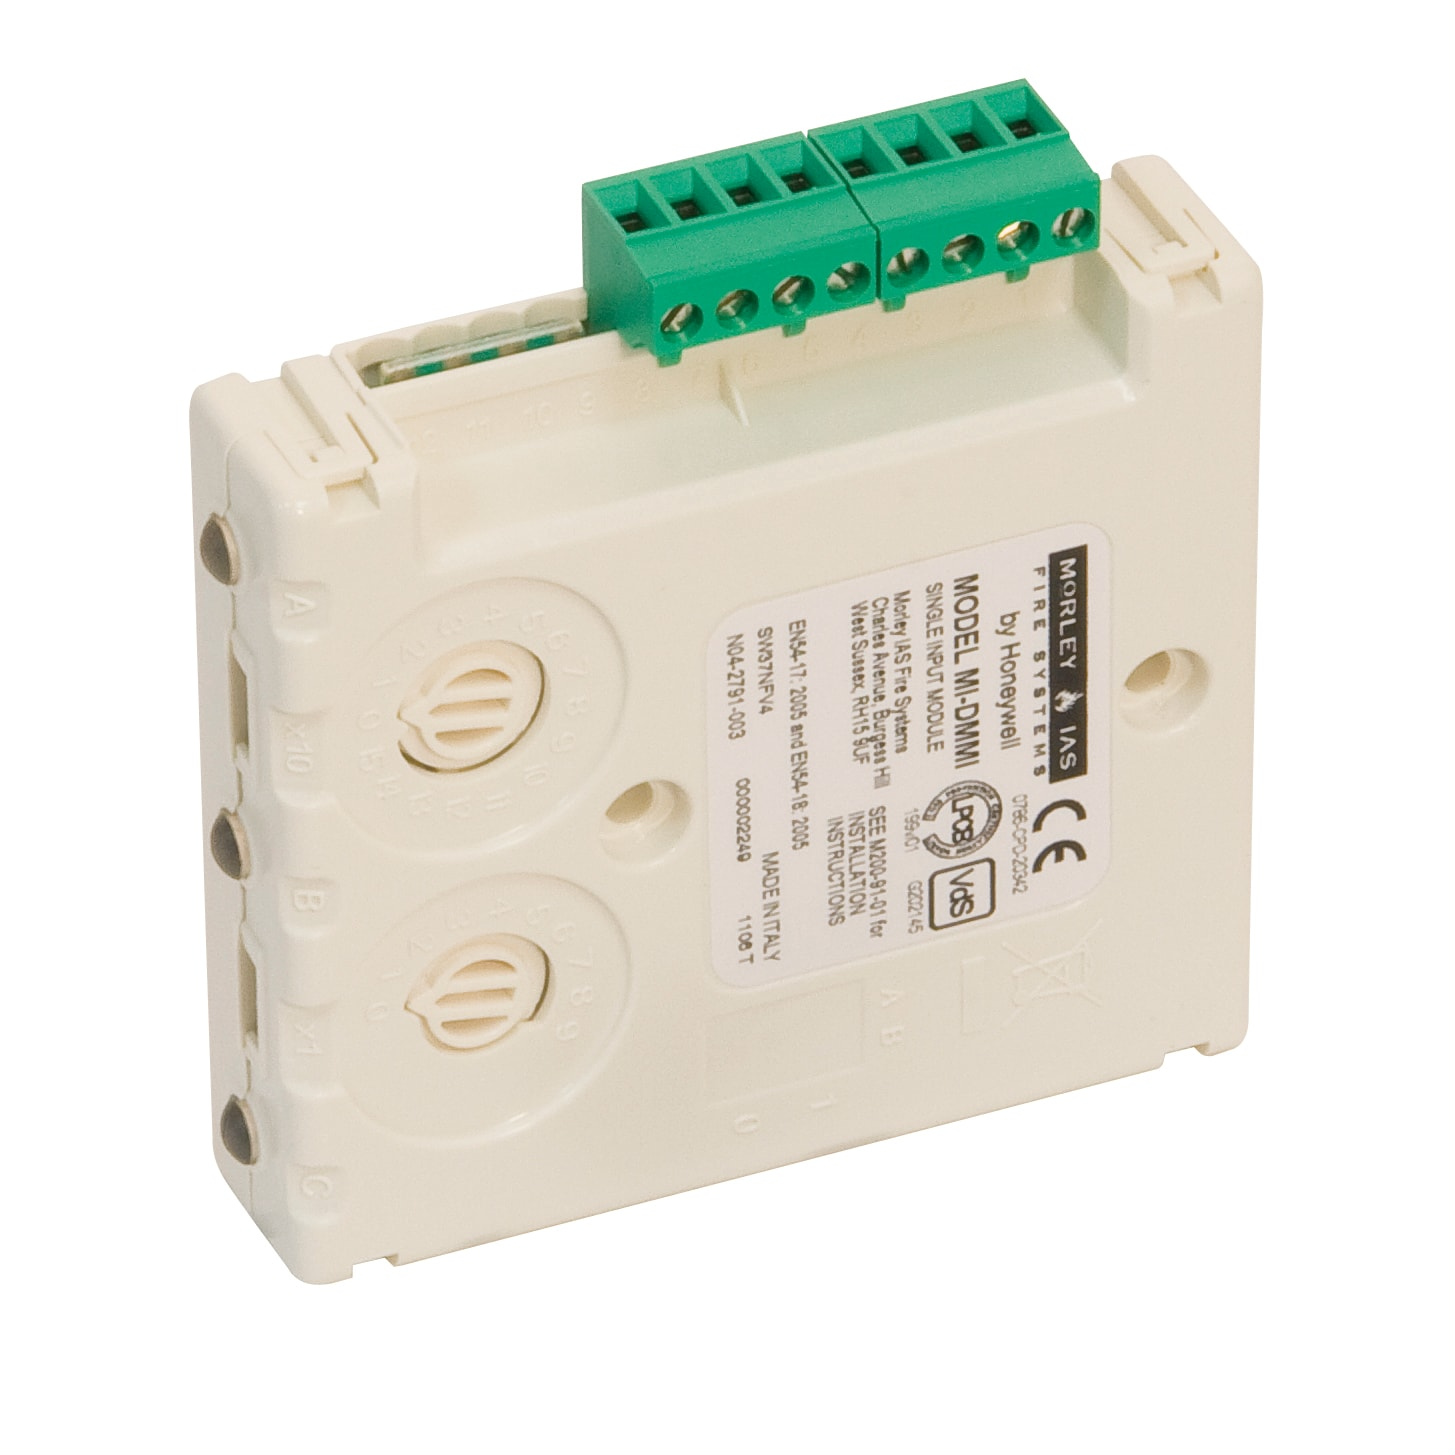 Single Channel Input Module Business Hls Austria Honeywell Home Alarm Wiring Diagram